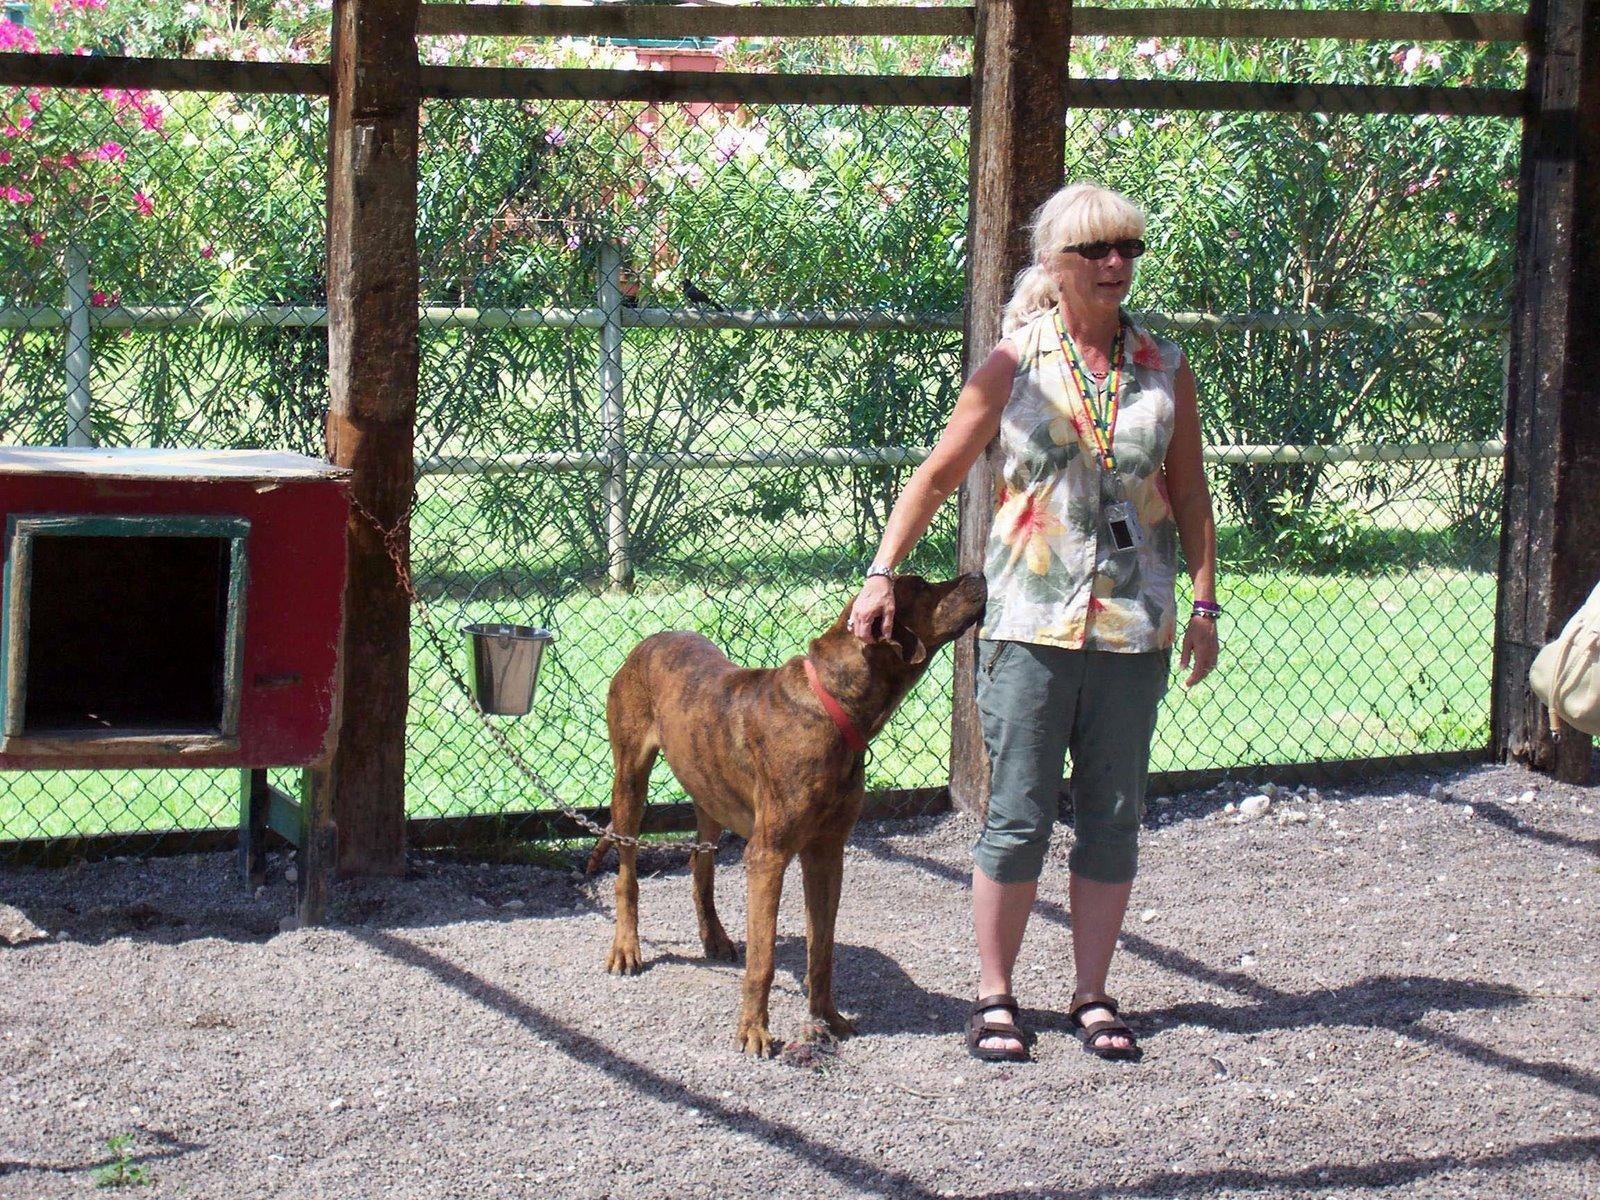 Chukka Cove Farm's DogSled Tours